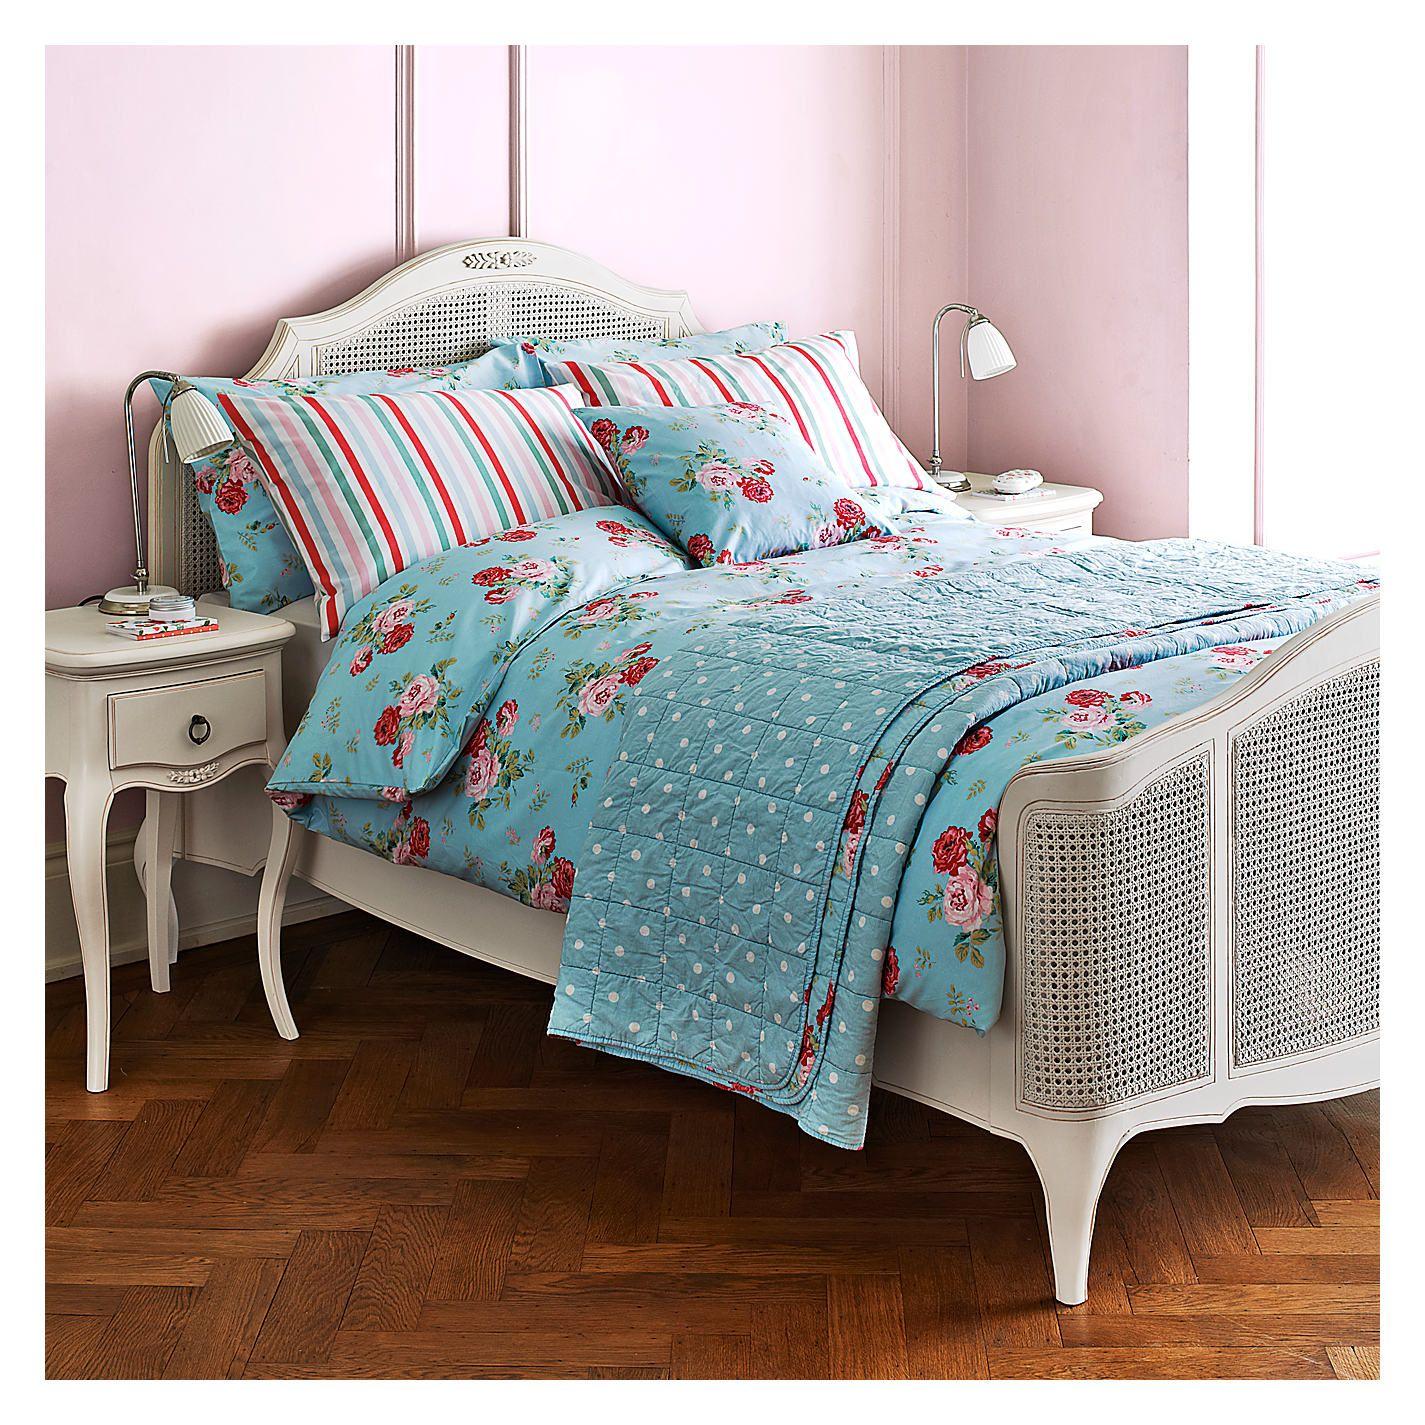 Bedroom Decorating Ideas Cath Kidston cath kidston bedding - google zoeken | cath kidston | pinterest